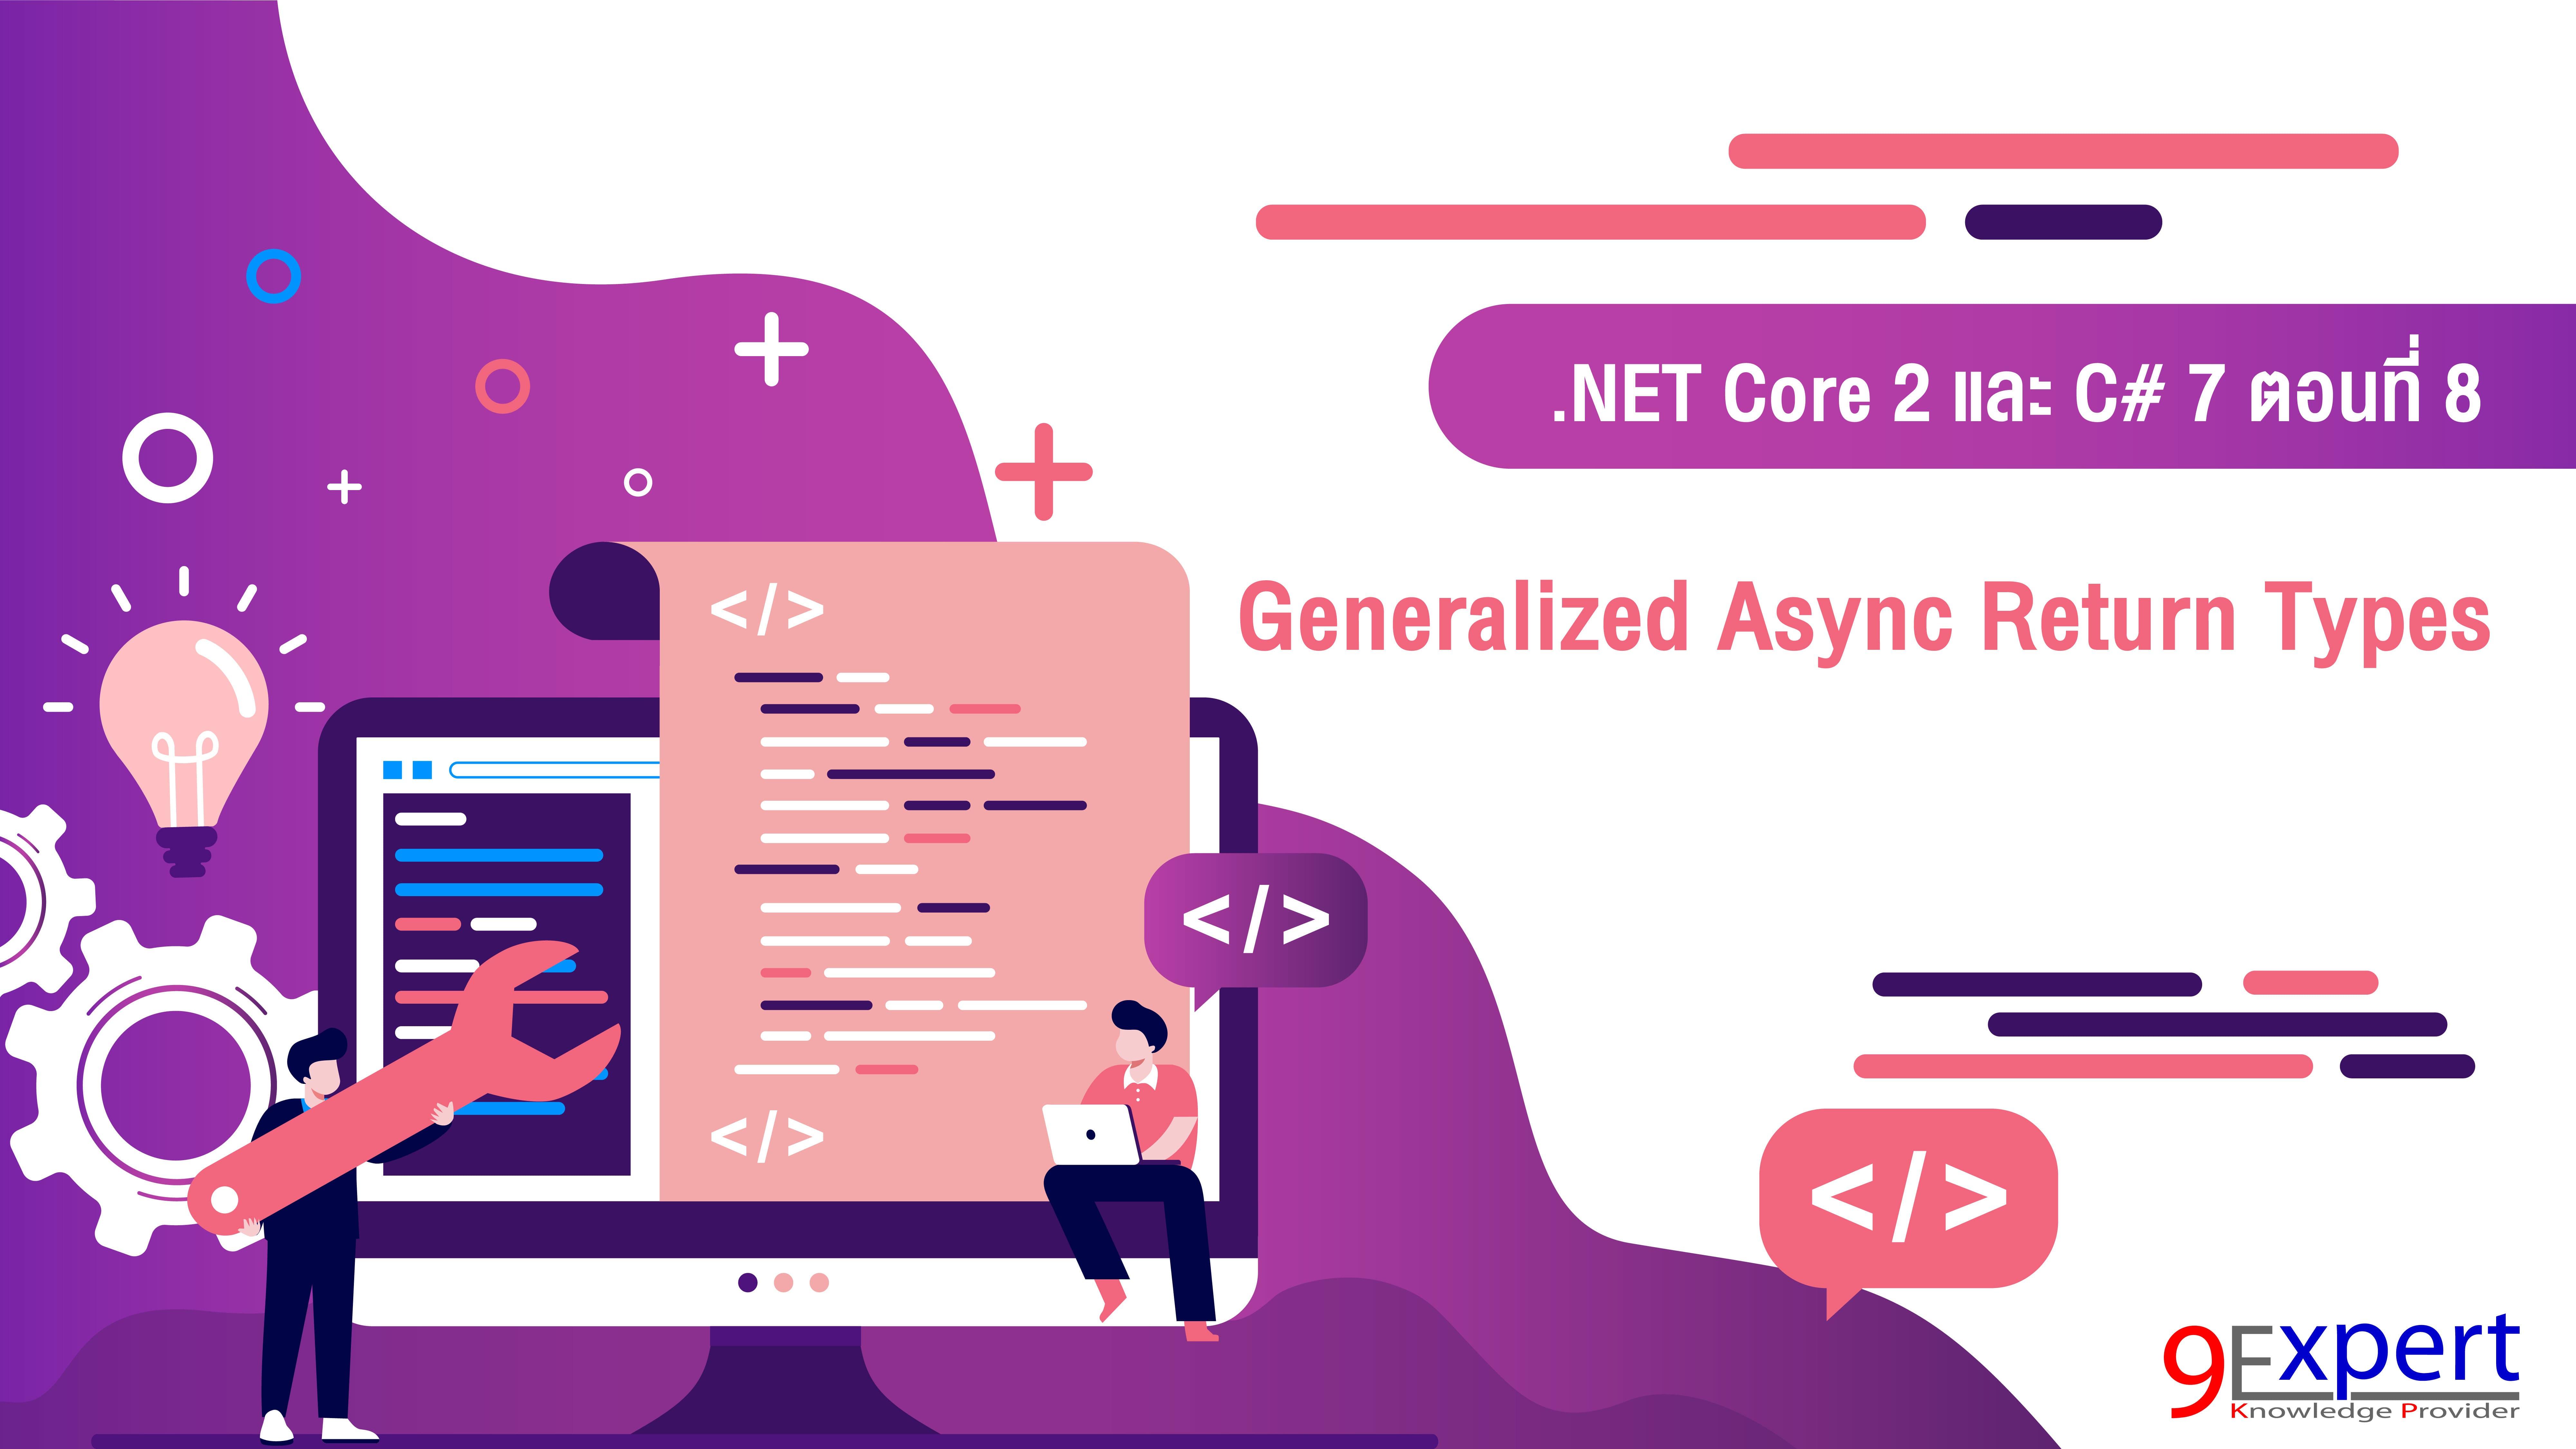 Generalized Async Return Types